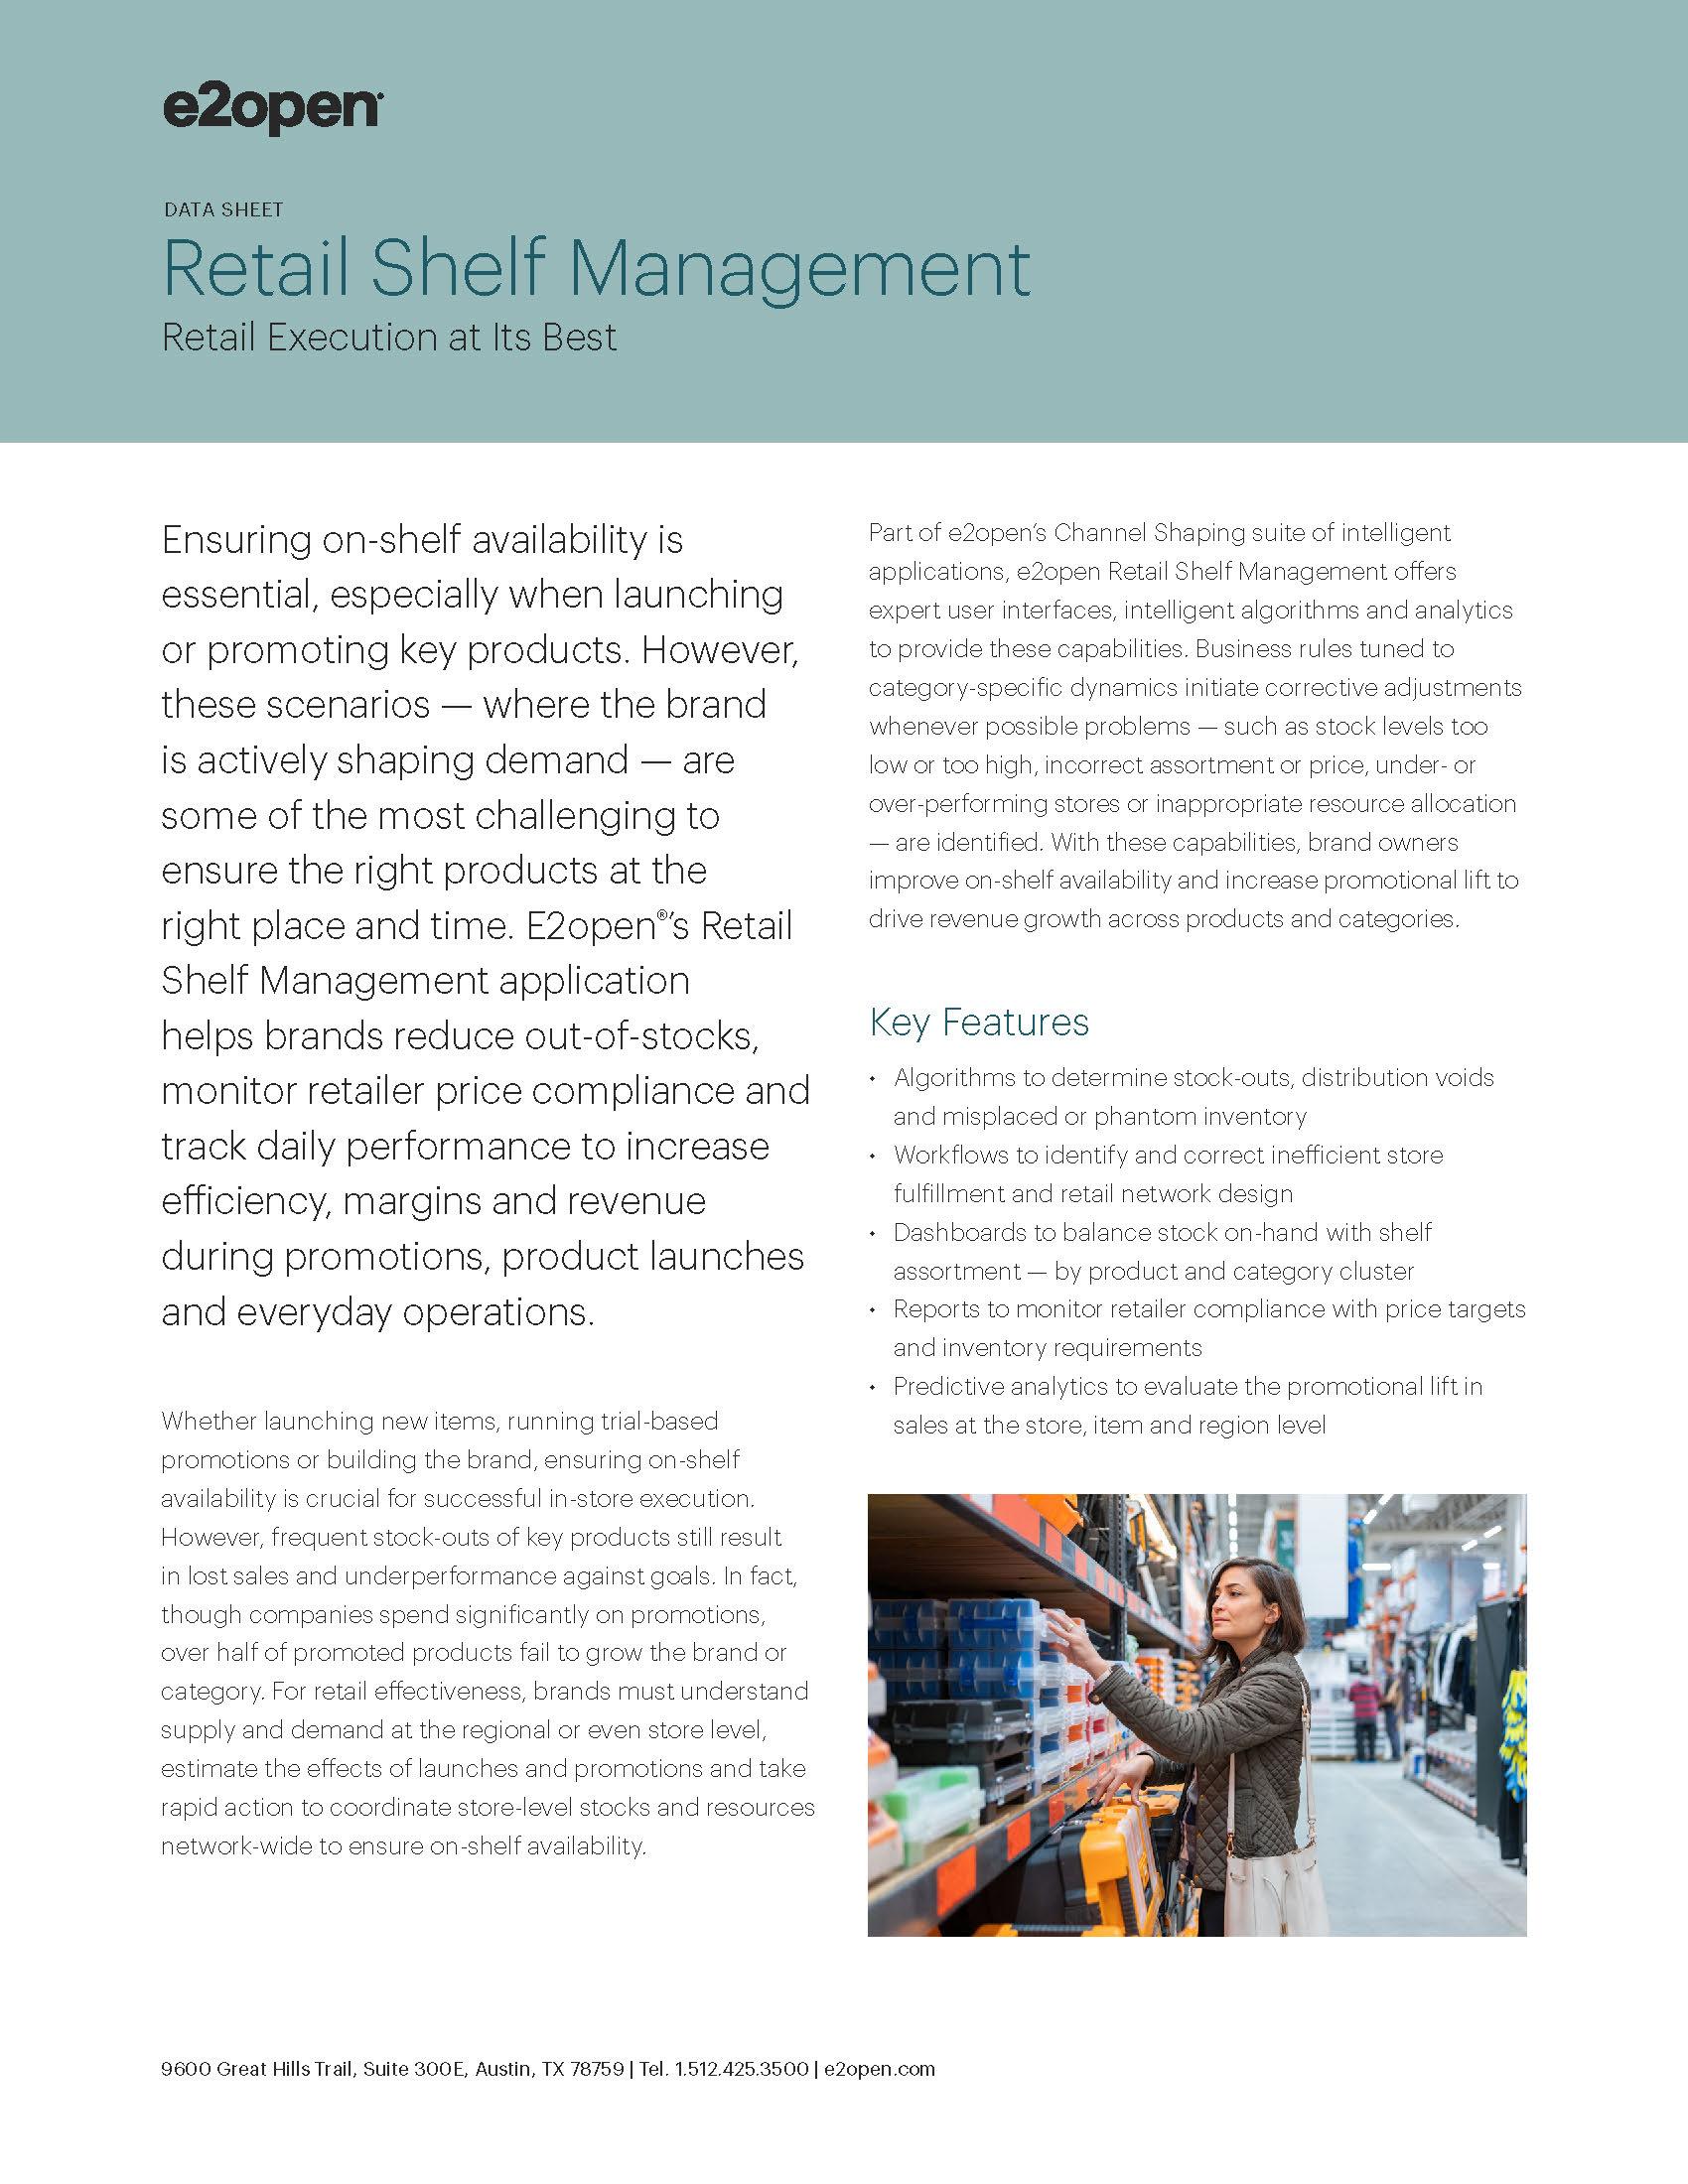 E2open Retail Shelf Management